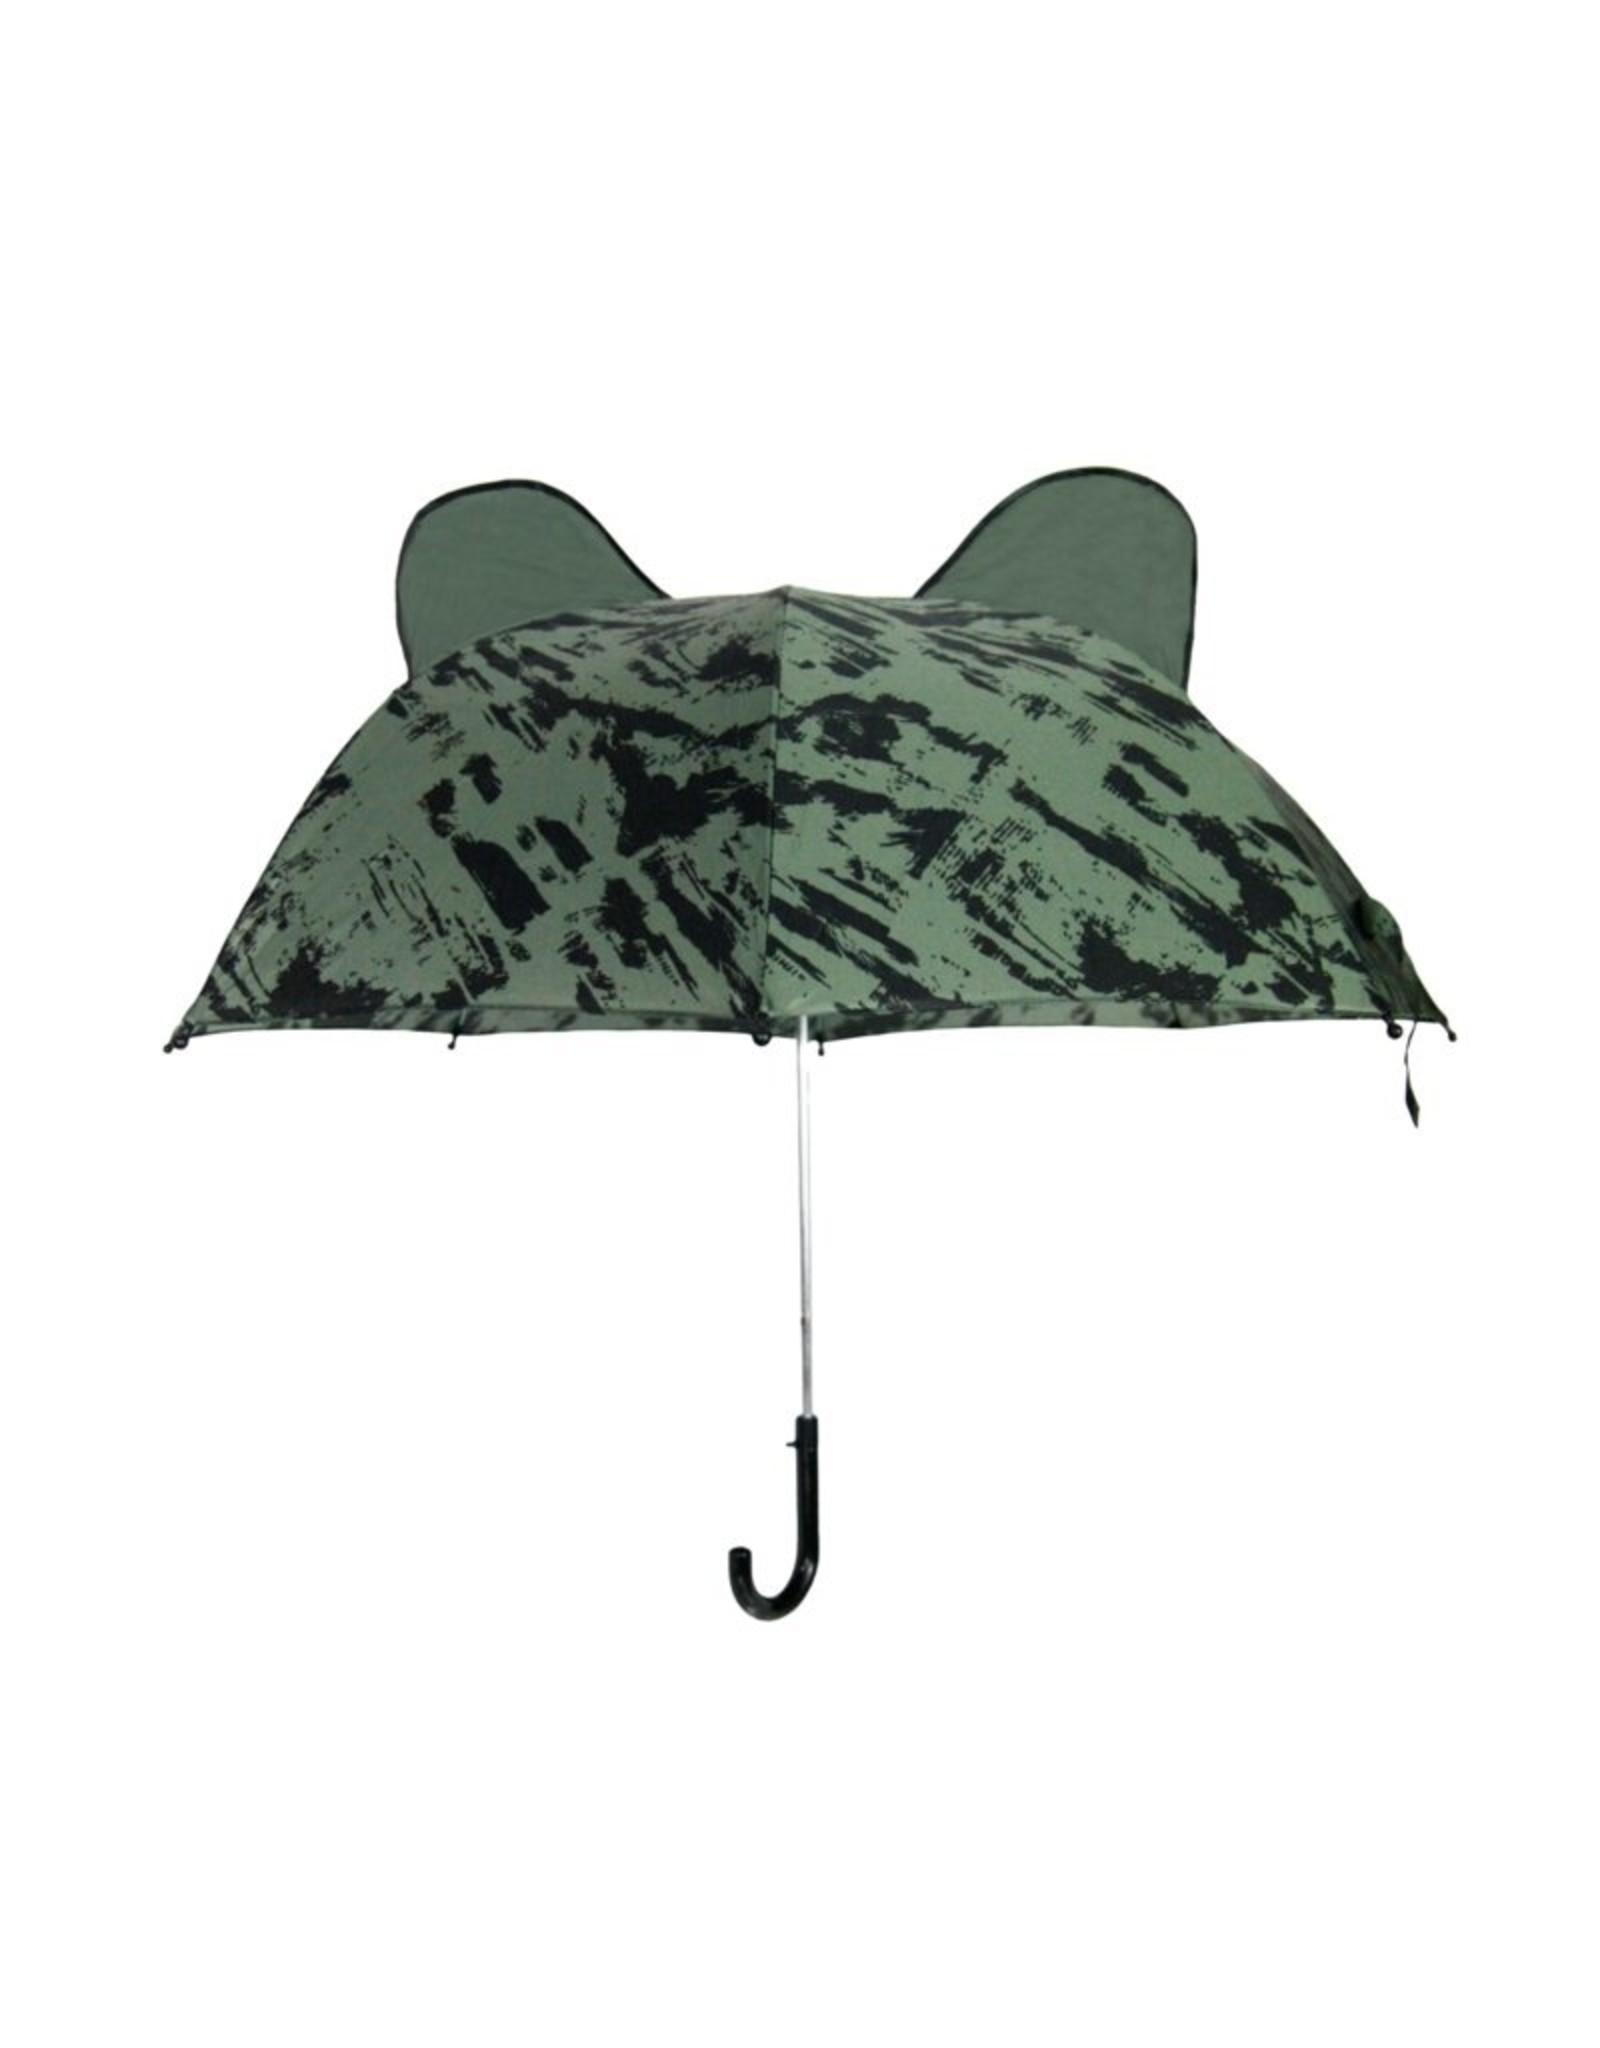 Van Pauline Van Pauline Umbrella Bear Green Distress